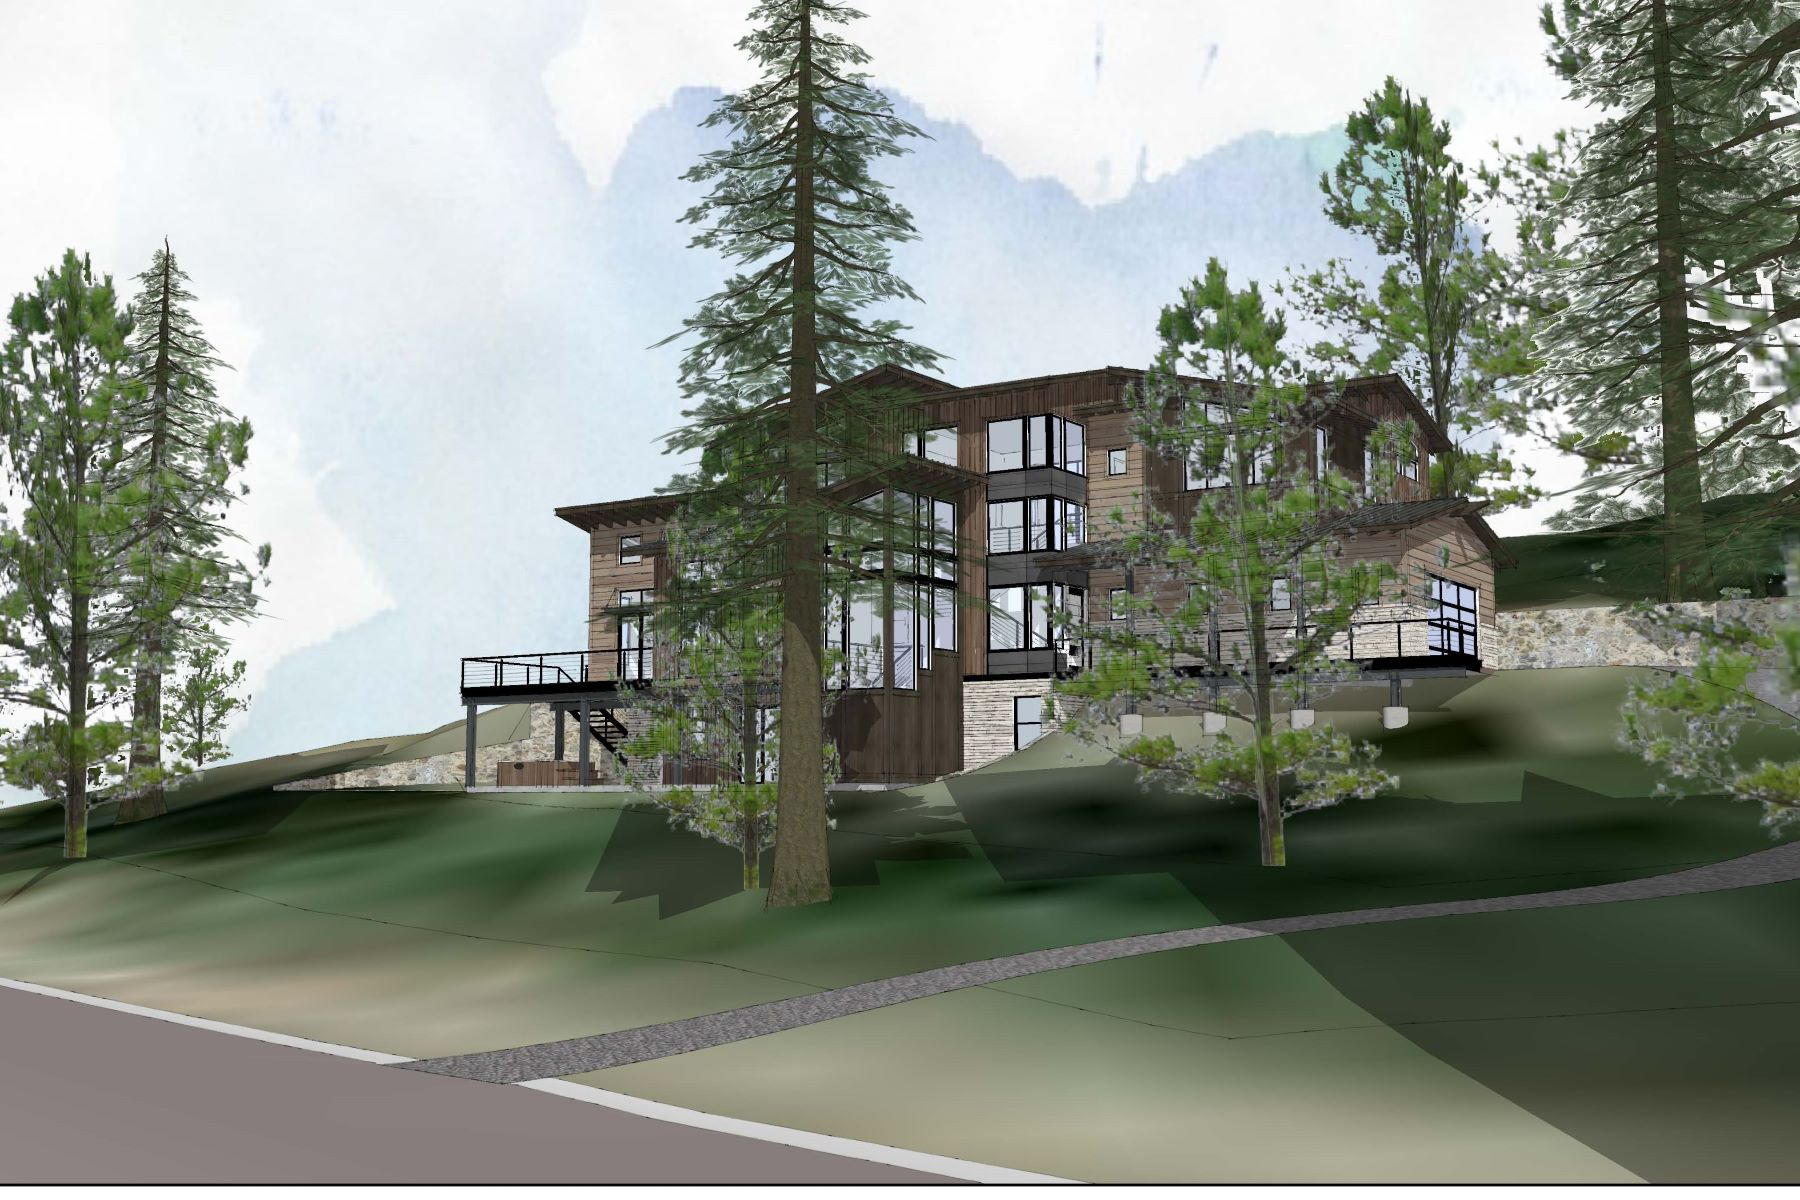 Property 为 销售 在 Stunning Luxury Lake View Home 6417 North Lake Boulevard 塔霍湖, 加利福尼亚州 96148 美国